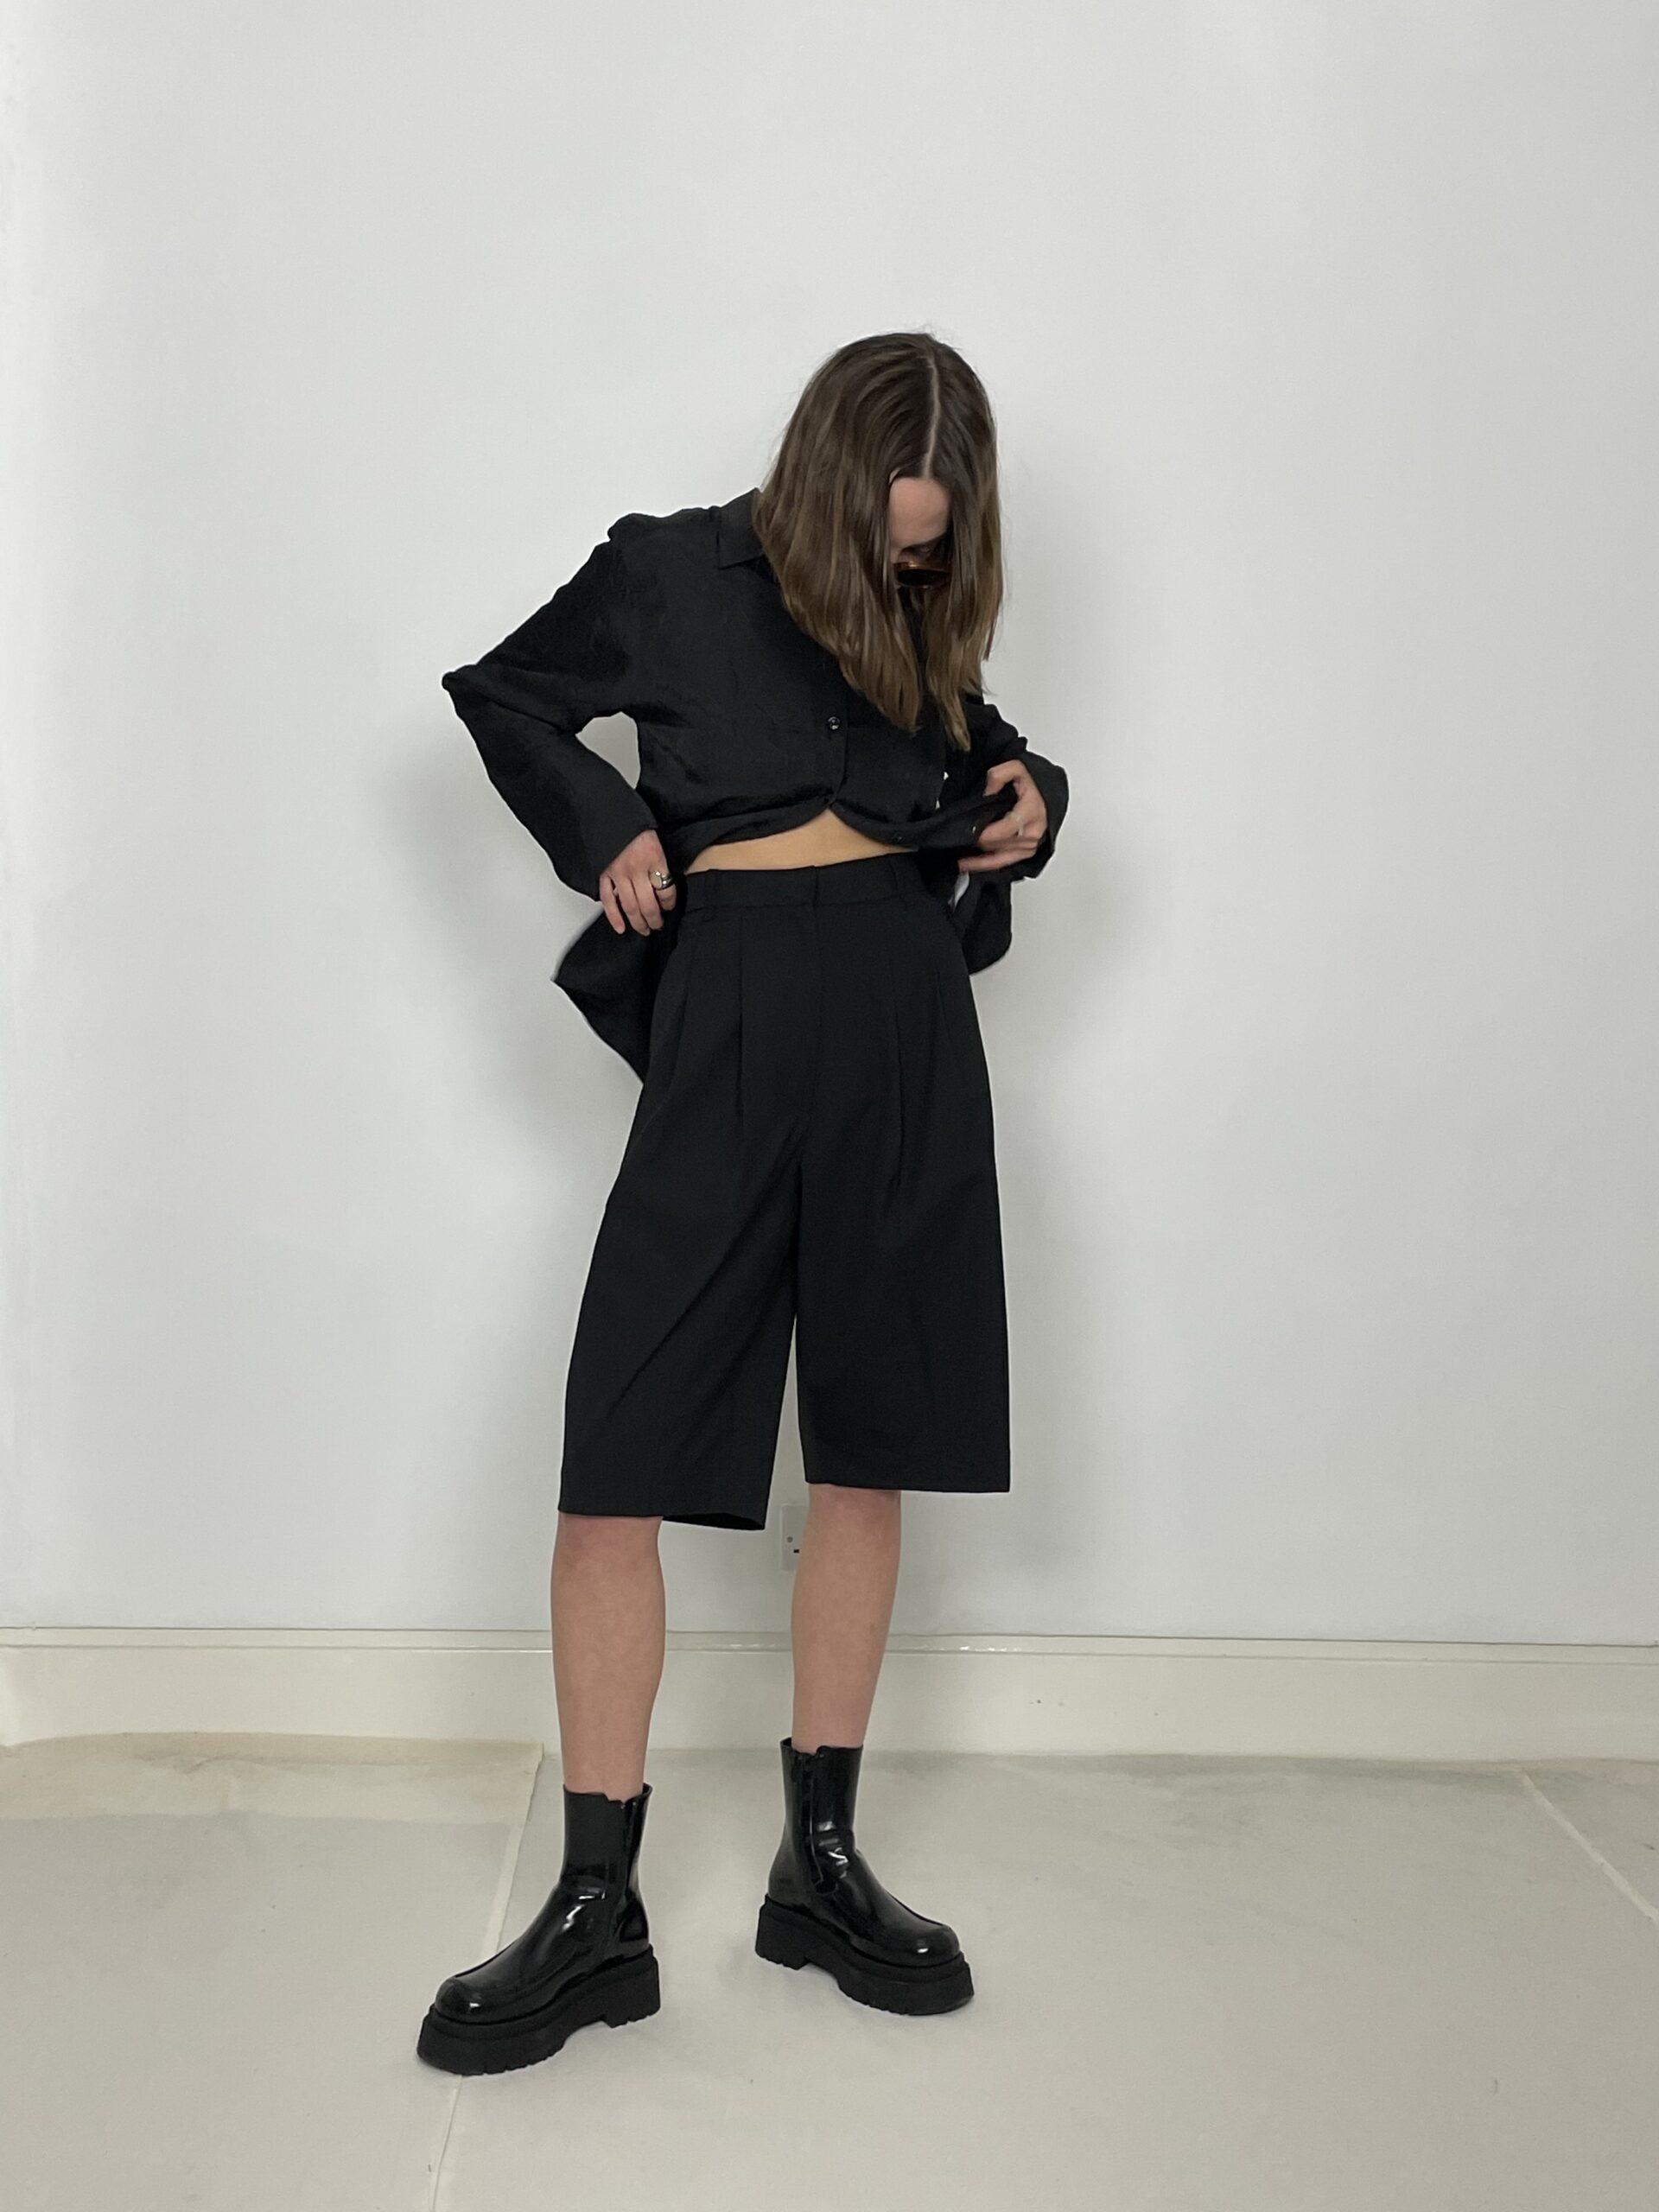 Statement tech shorts in black